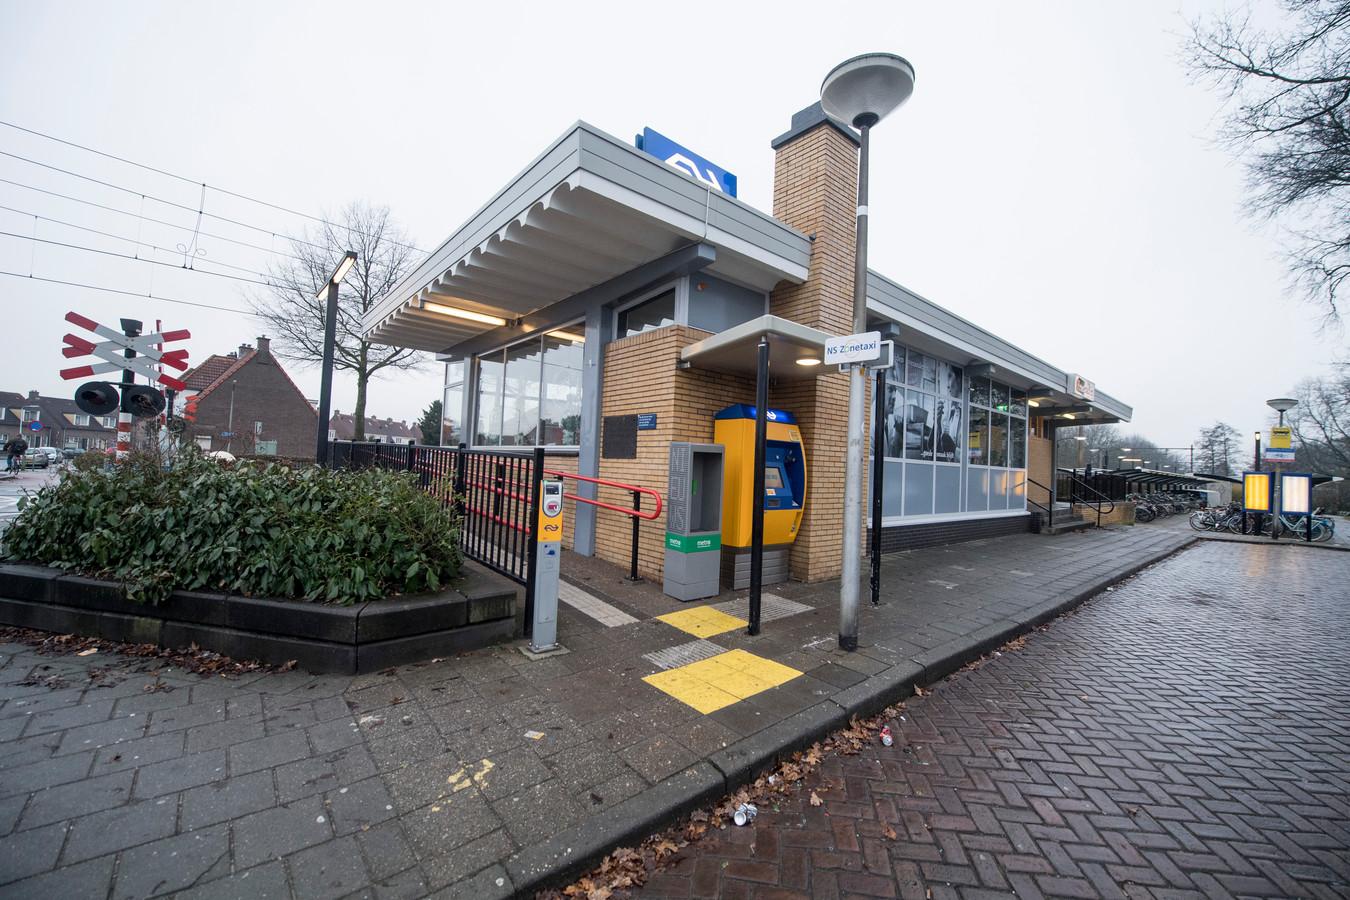 Station Almelo de Riet